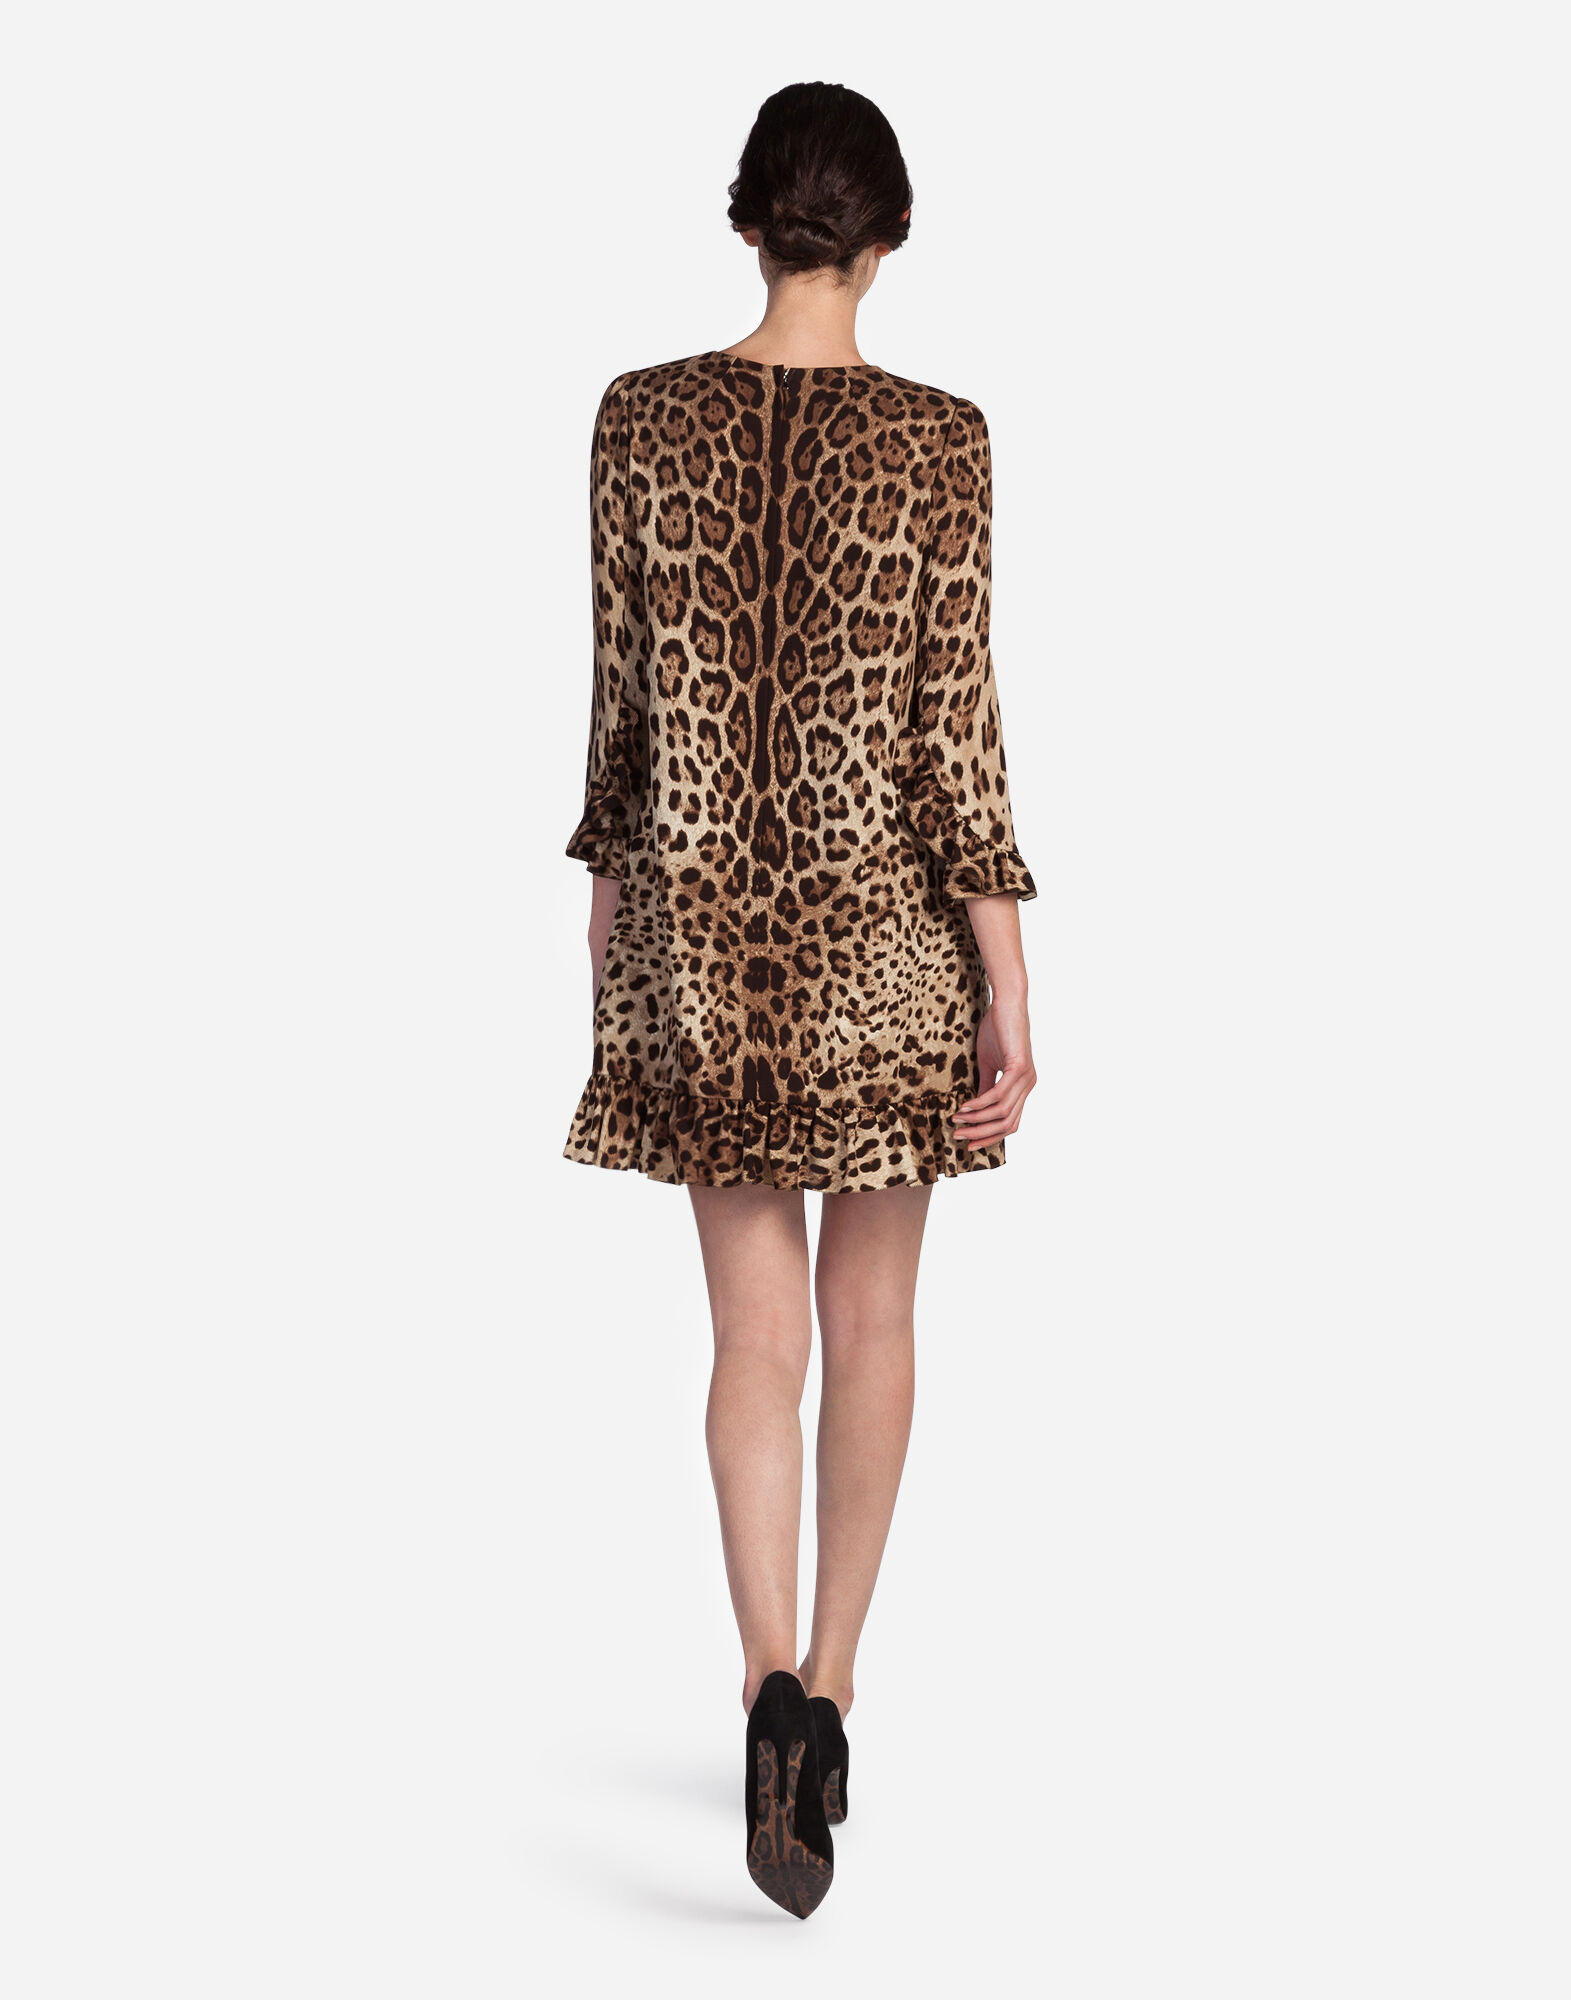 LEOPARD PRINT CADY DRESS